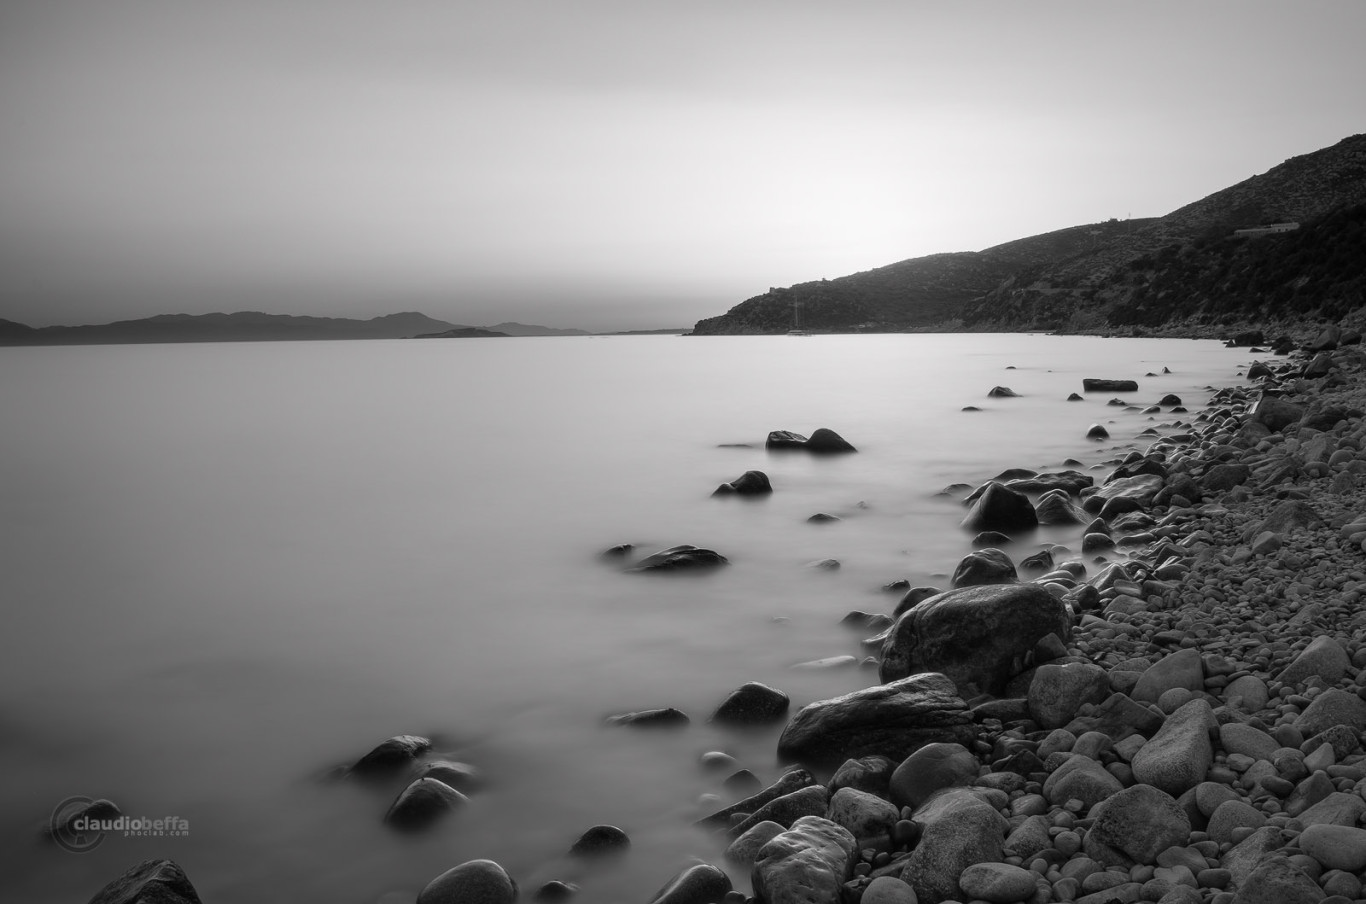 Italy, Travel, Pentax, Claudio Beffa, Nature, Sea, Sunset, Sardinia, Sardegna, Rocks, Long exposure, HDR